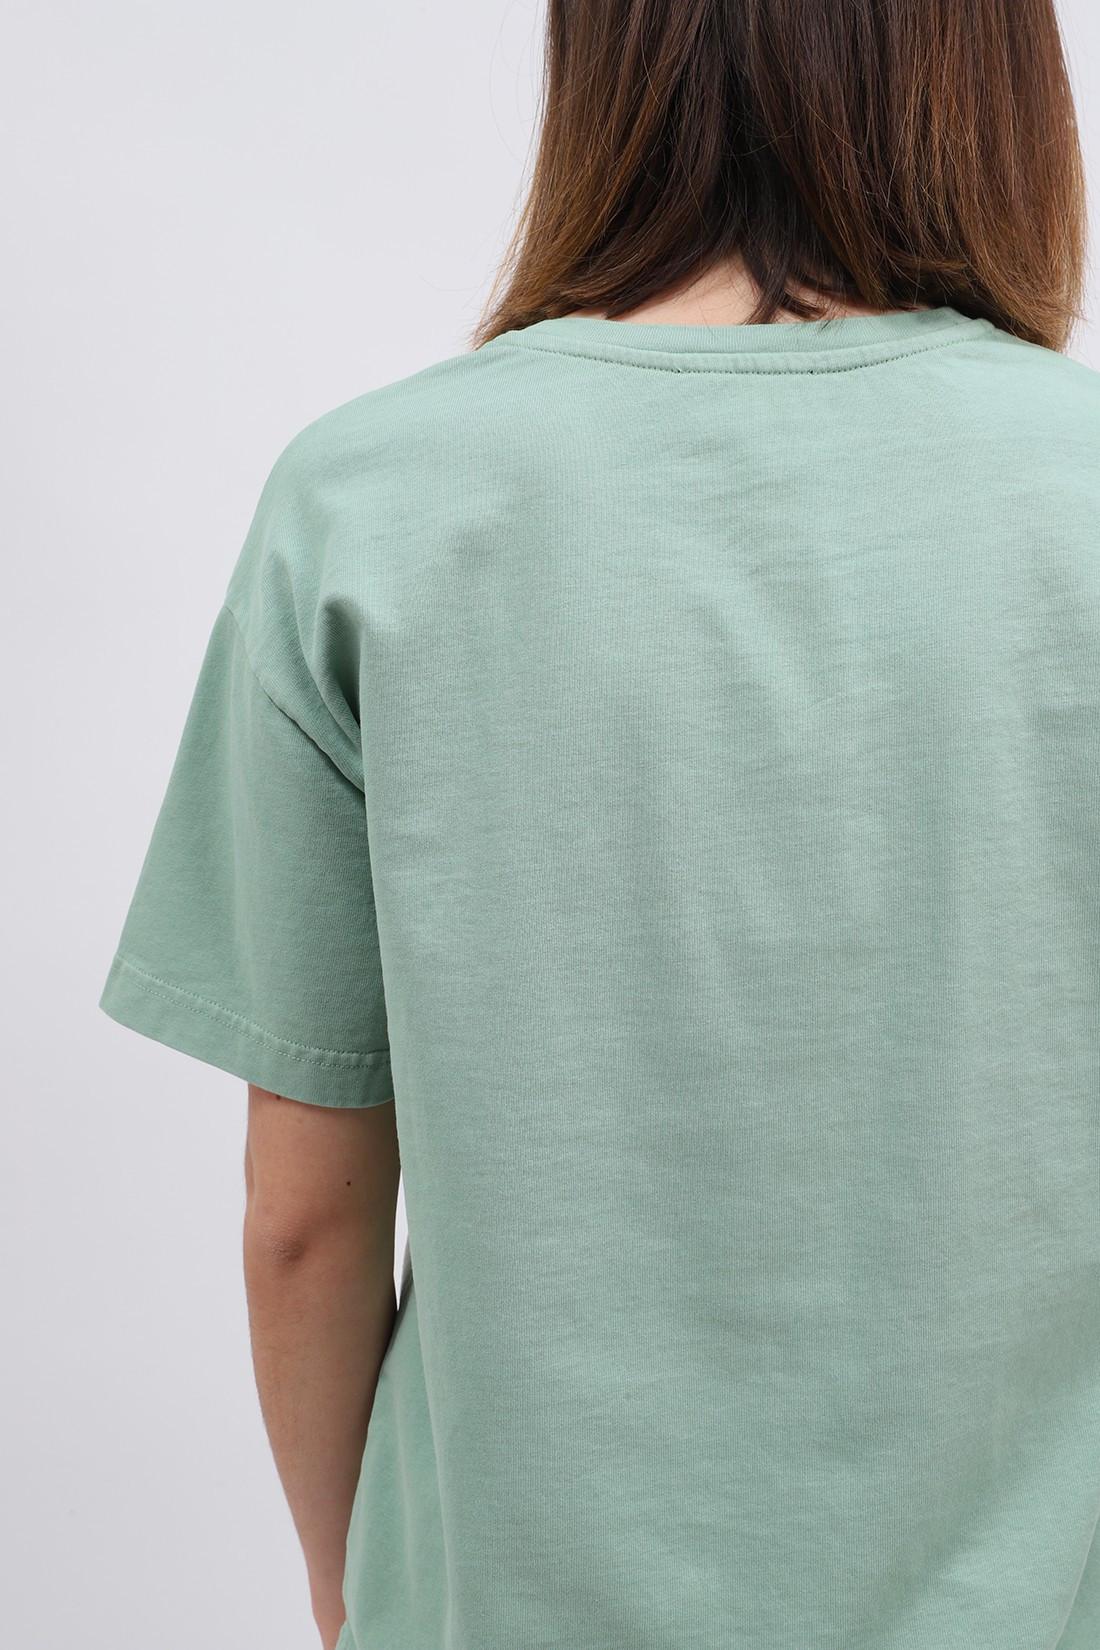 A.P.C. FOR WOMAN / T-shirt hope Vert pale